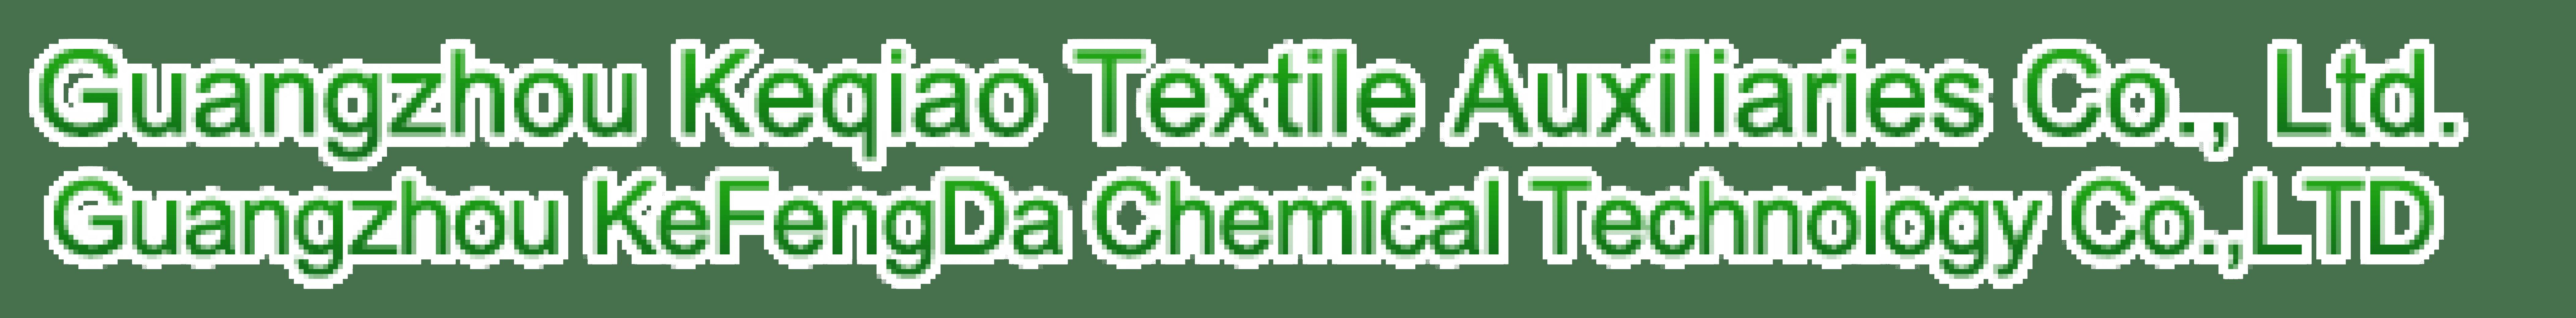 Guangzhou KeSiDa Textile Auxiliaries Co., LTD